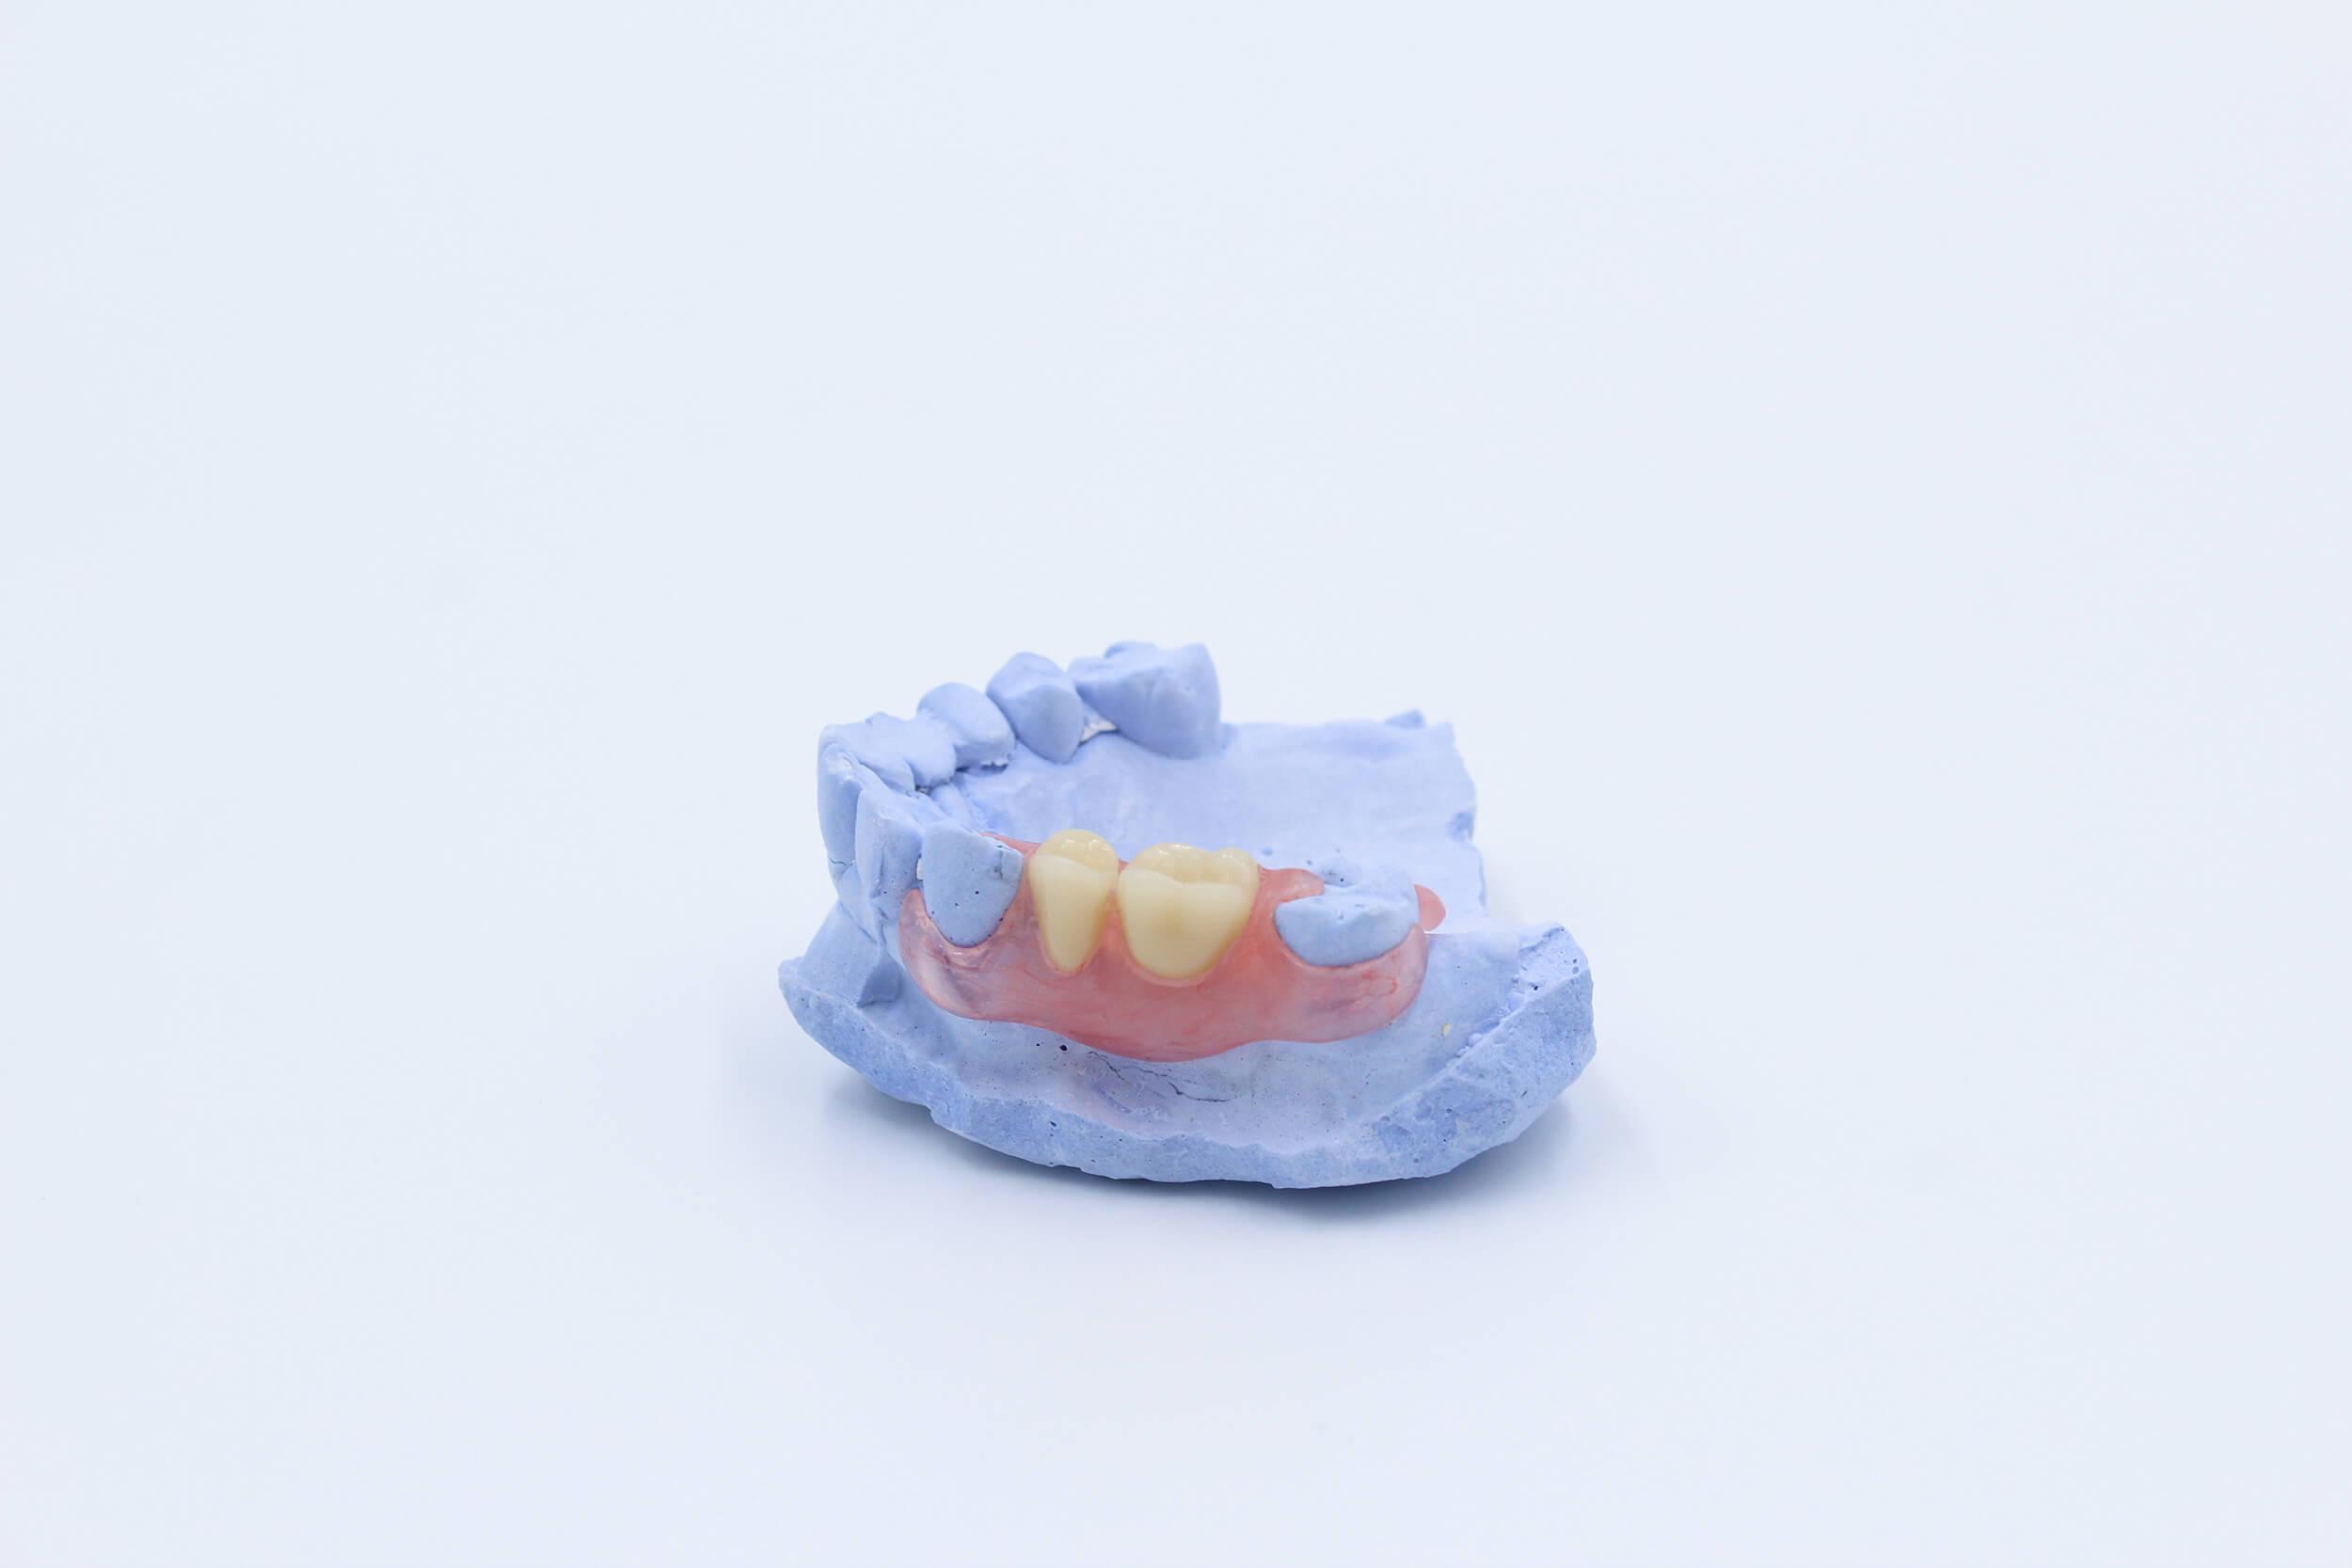 coronas-dentales-clinik-tj